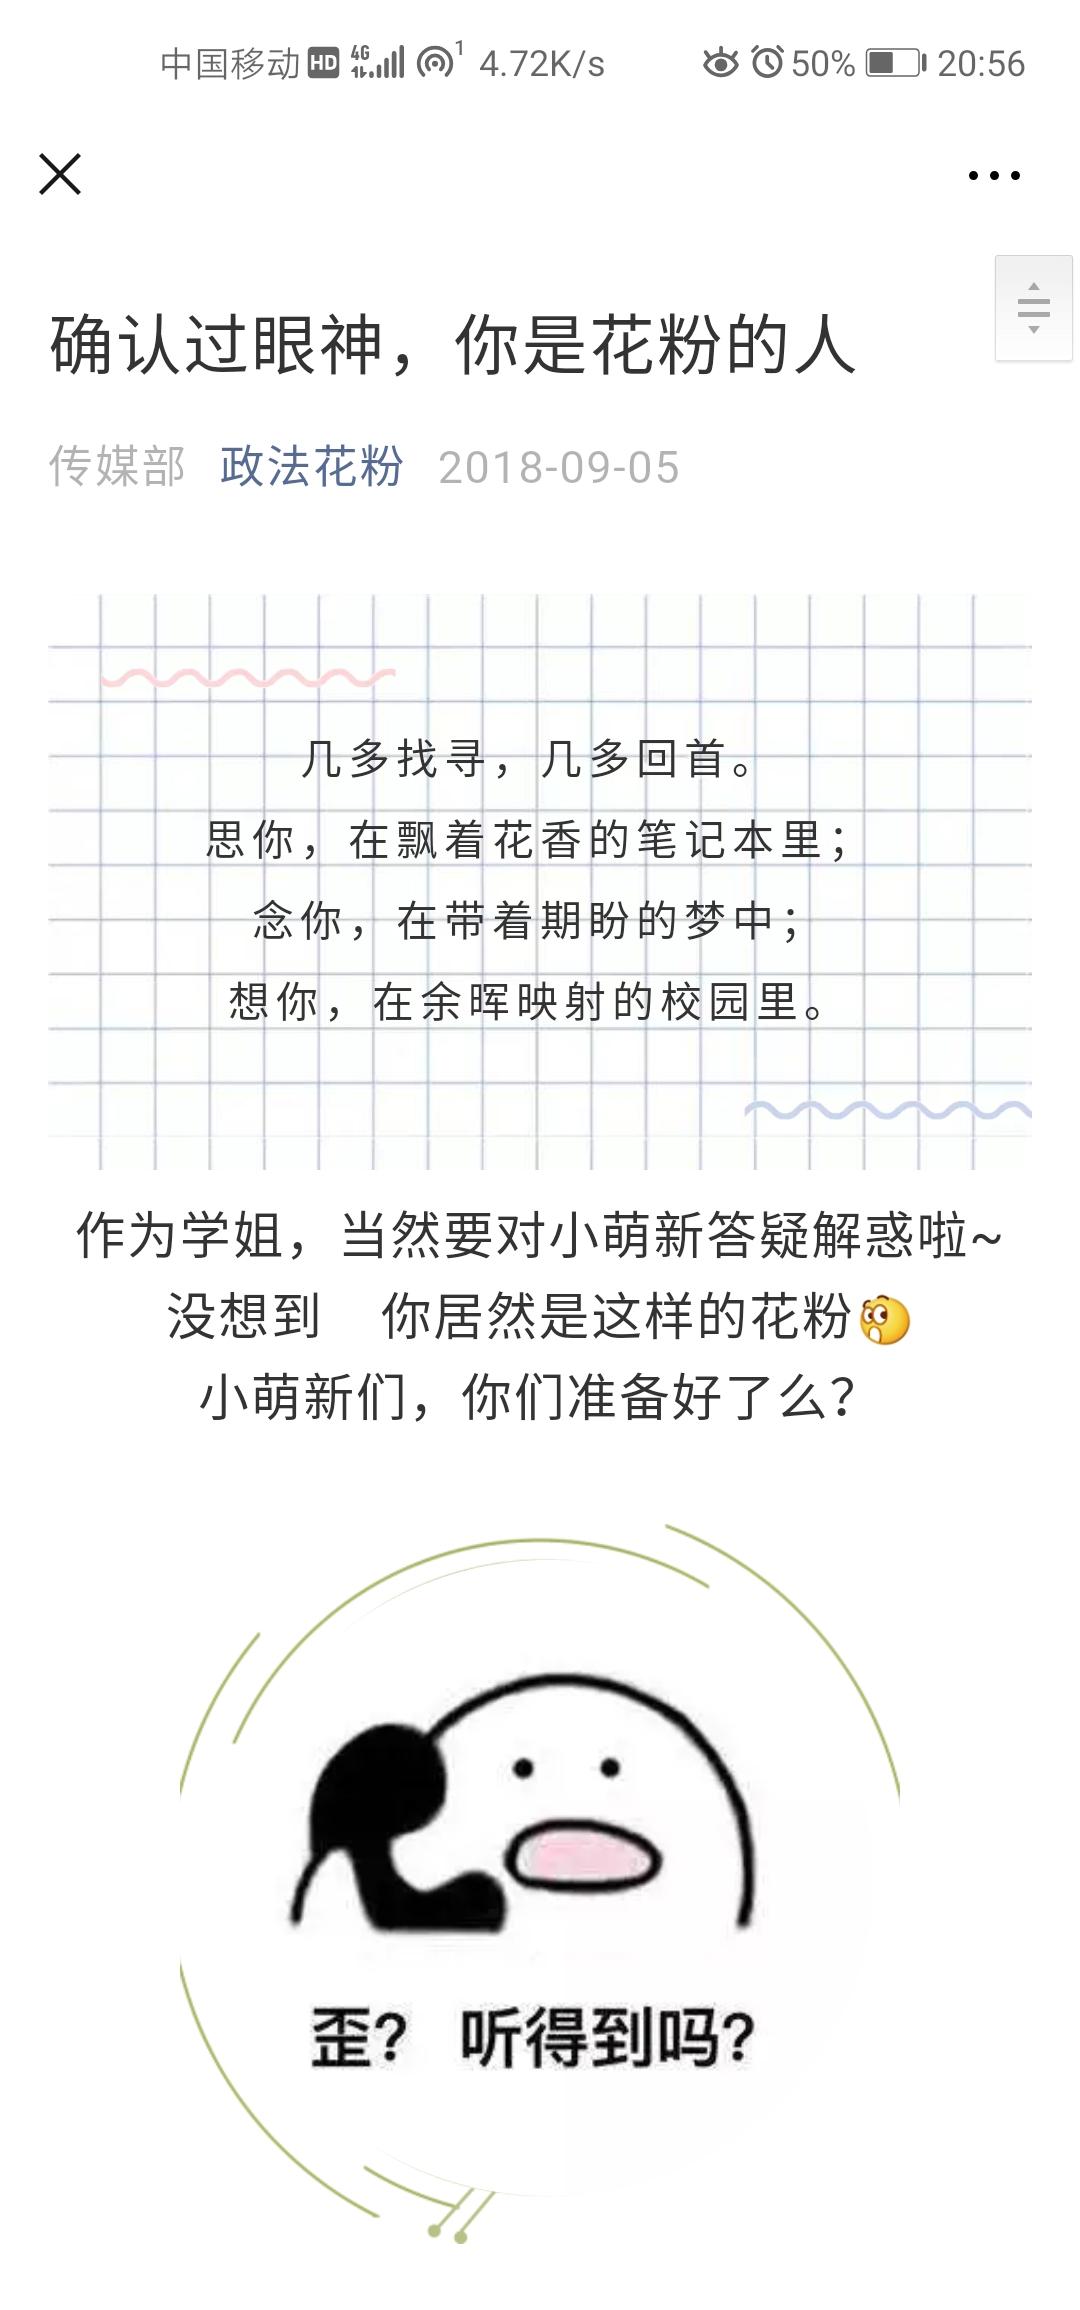 Screenshot_20190210_205624_com.tencent.mm.jpg